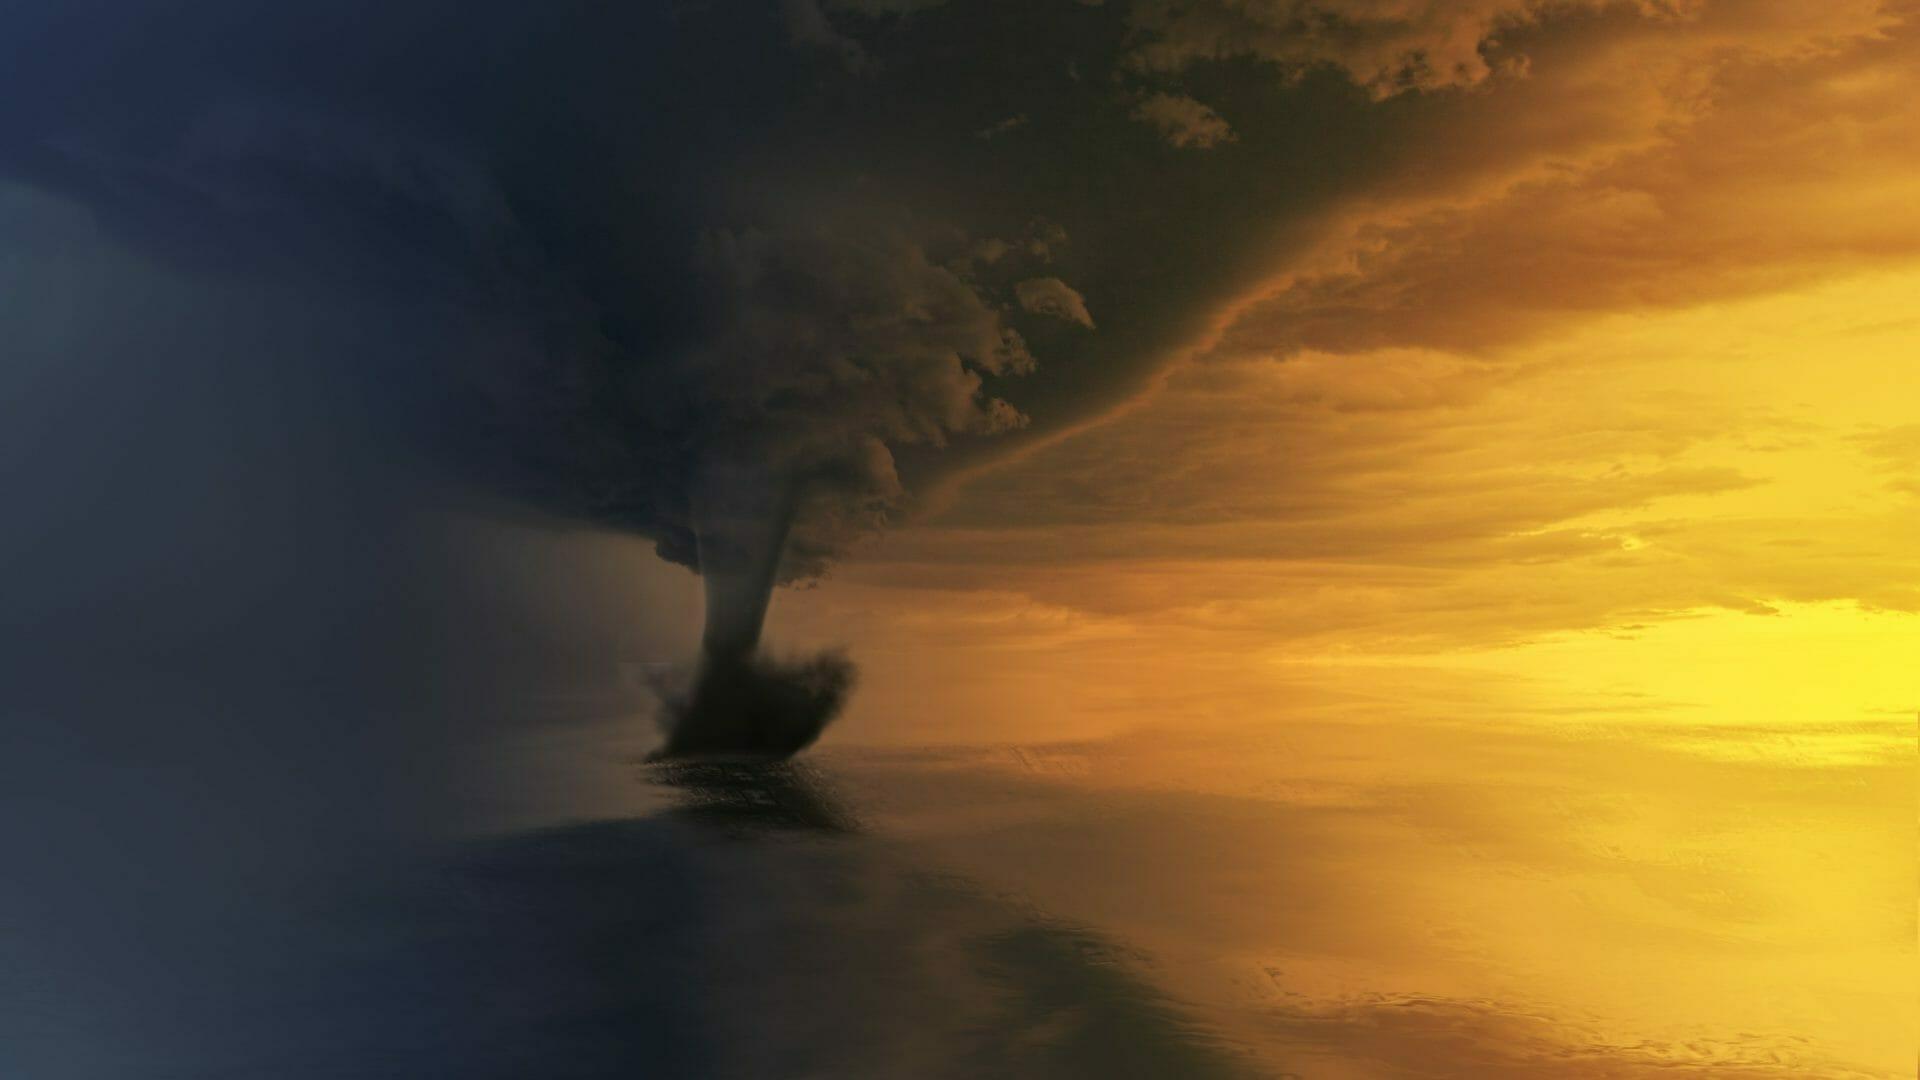 When Should I Install My Generator for Hurricane Season?